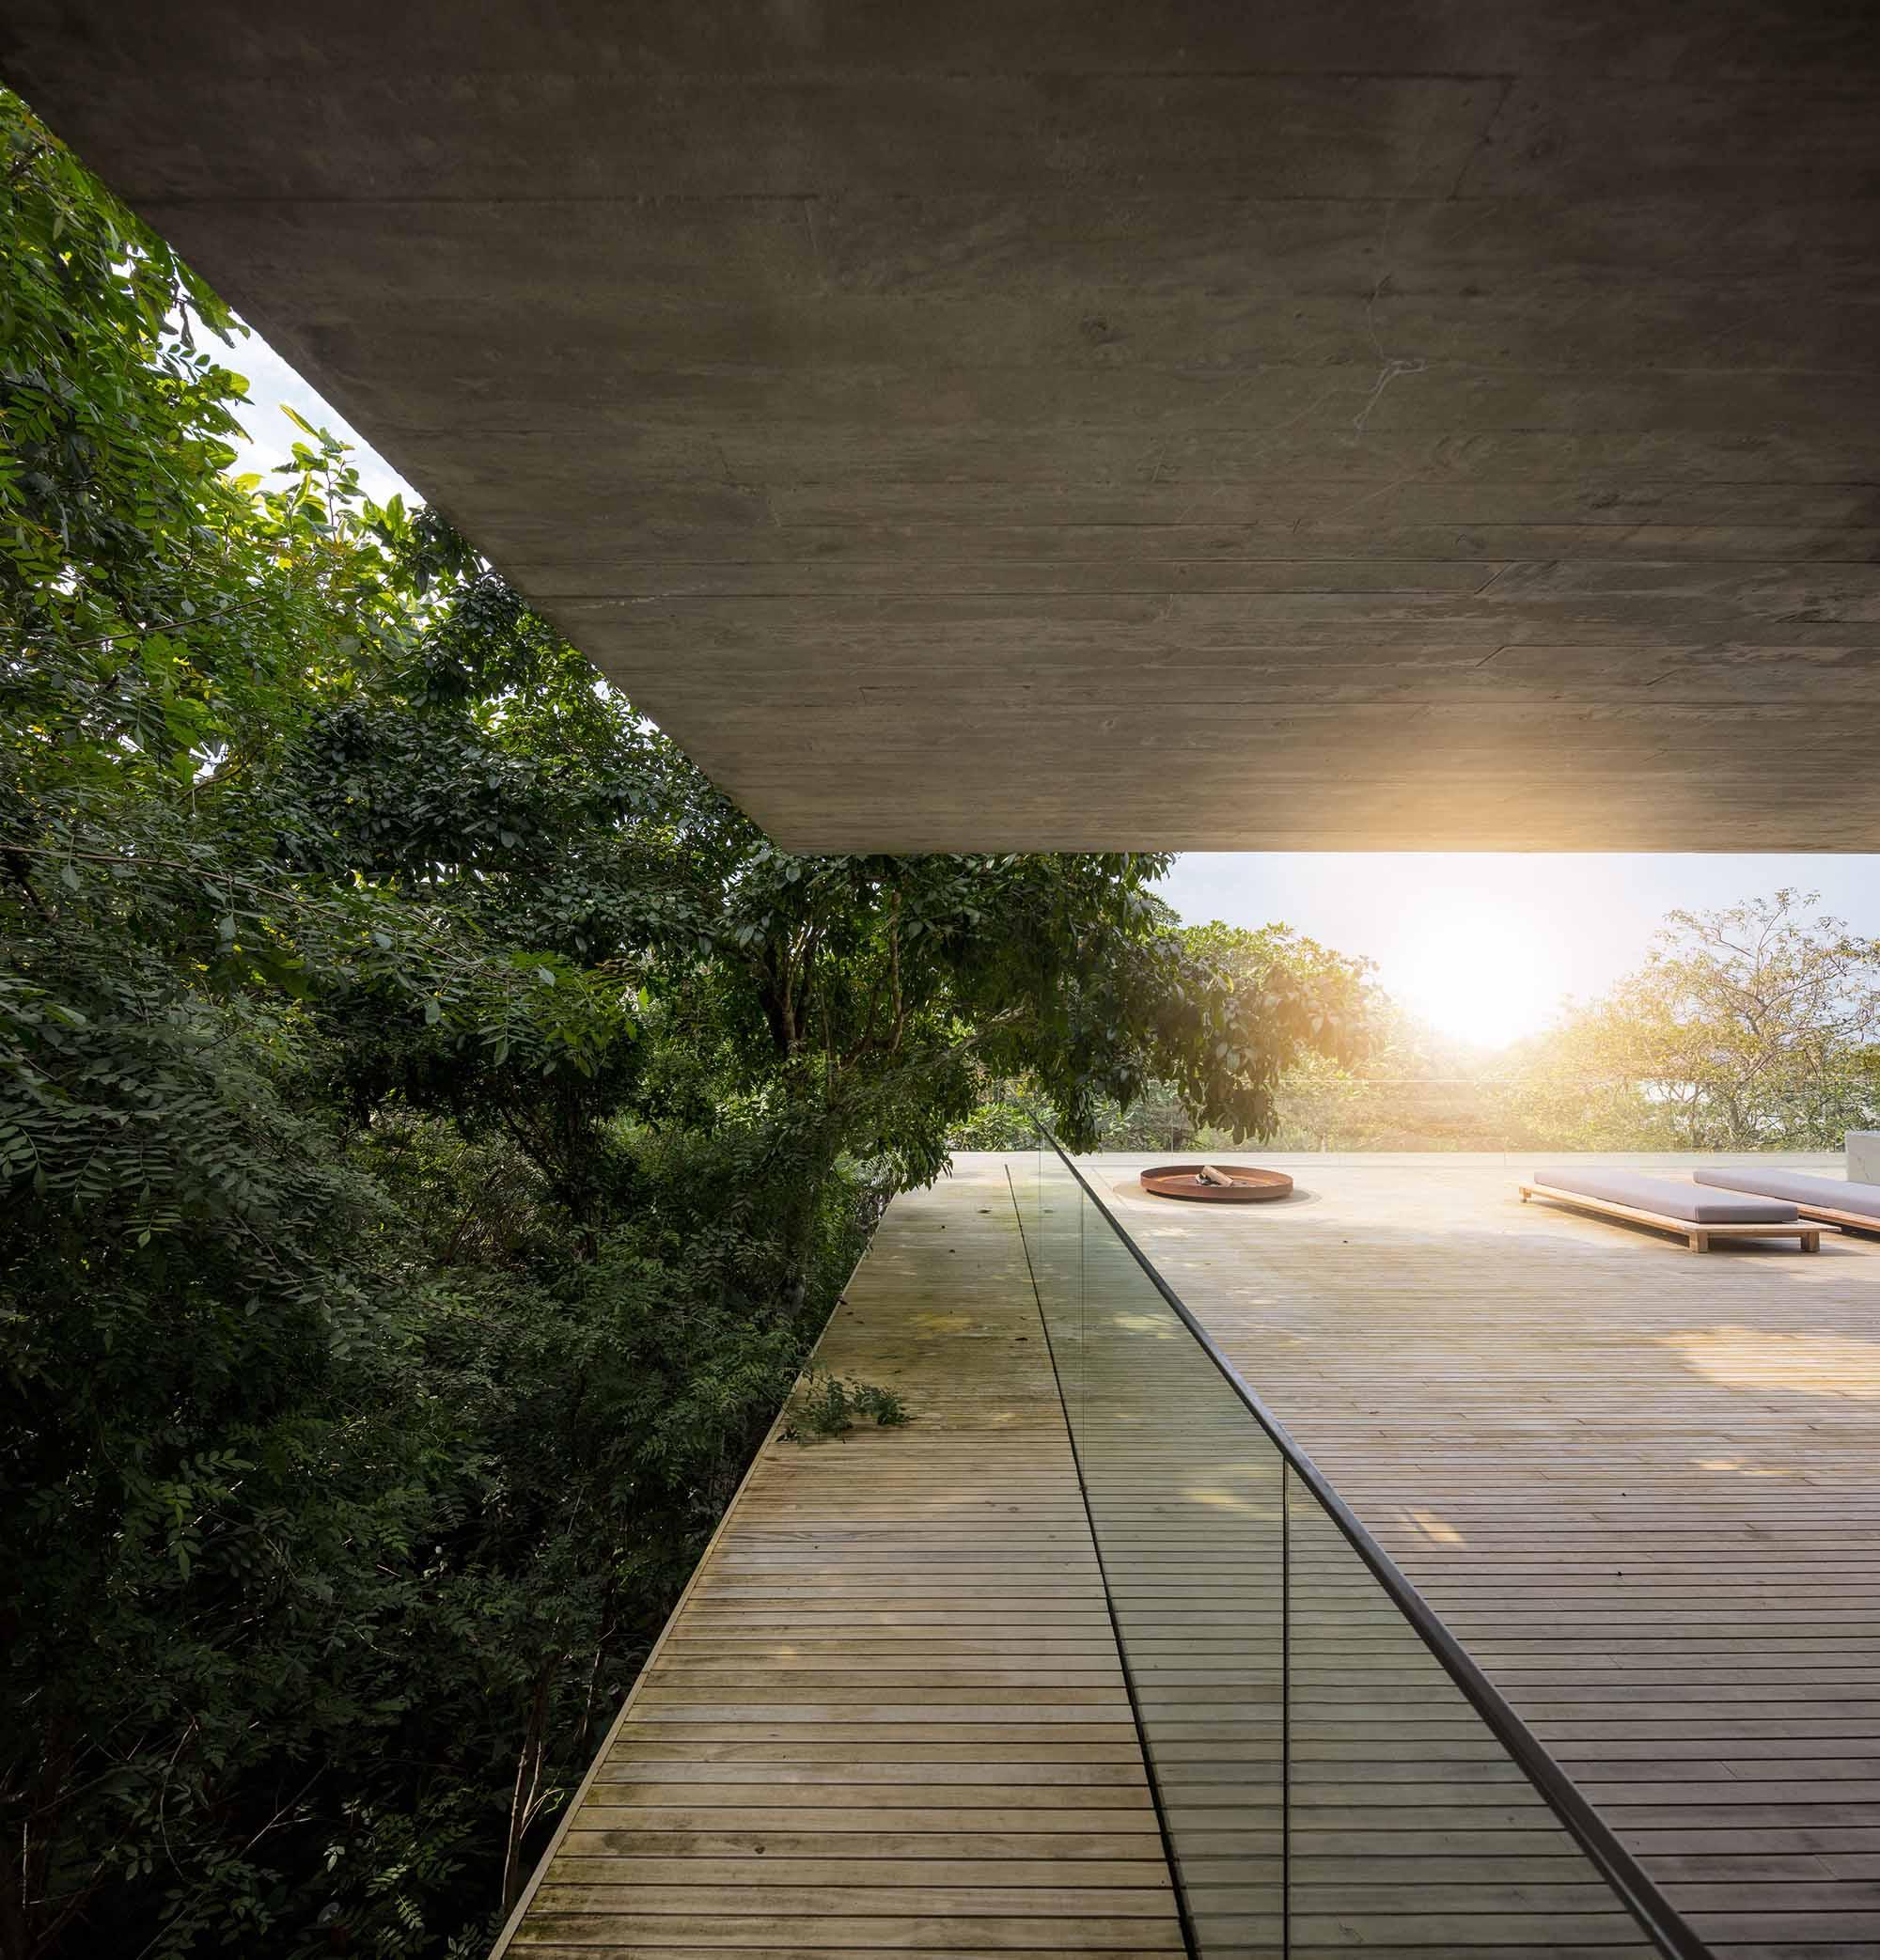 H-House-Life-Jungle-House-Casa-Da-Mata-studio-mk27-mk27_namata_fernandoguerra_medium(35).JPG